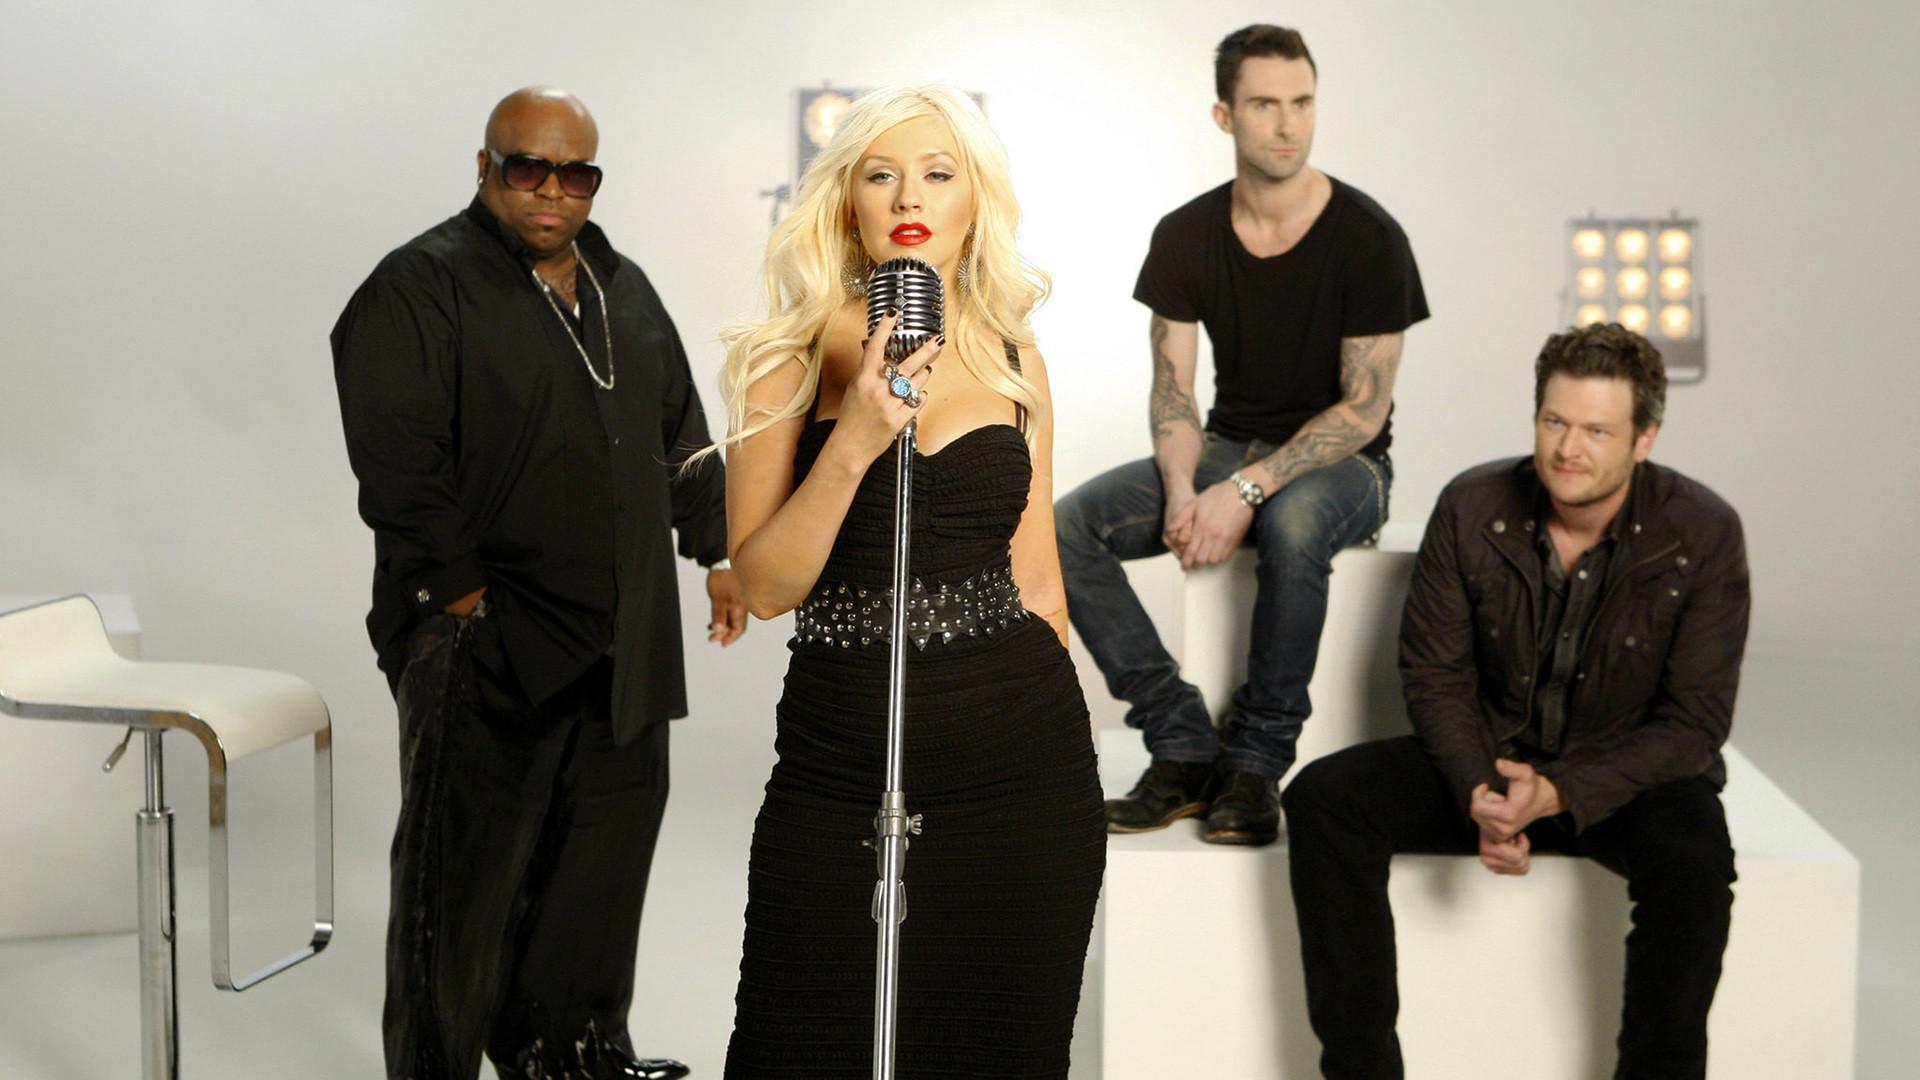 The Voice (US) (S16E18): Live Top 13 Performances Summary